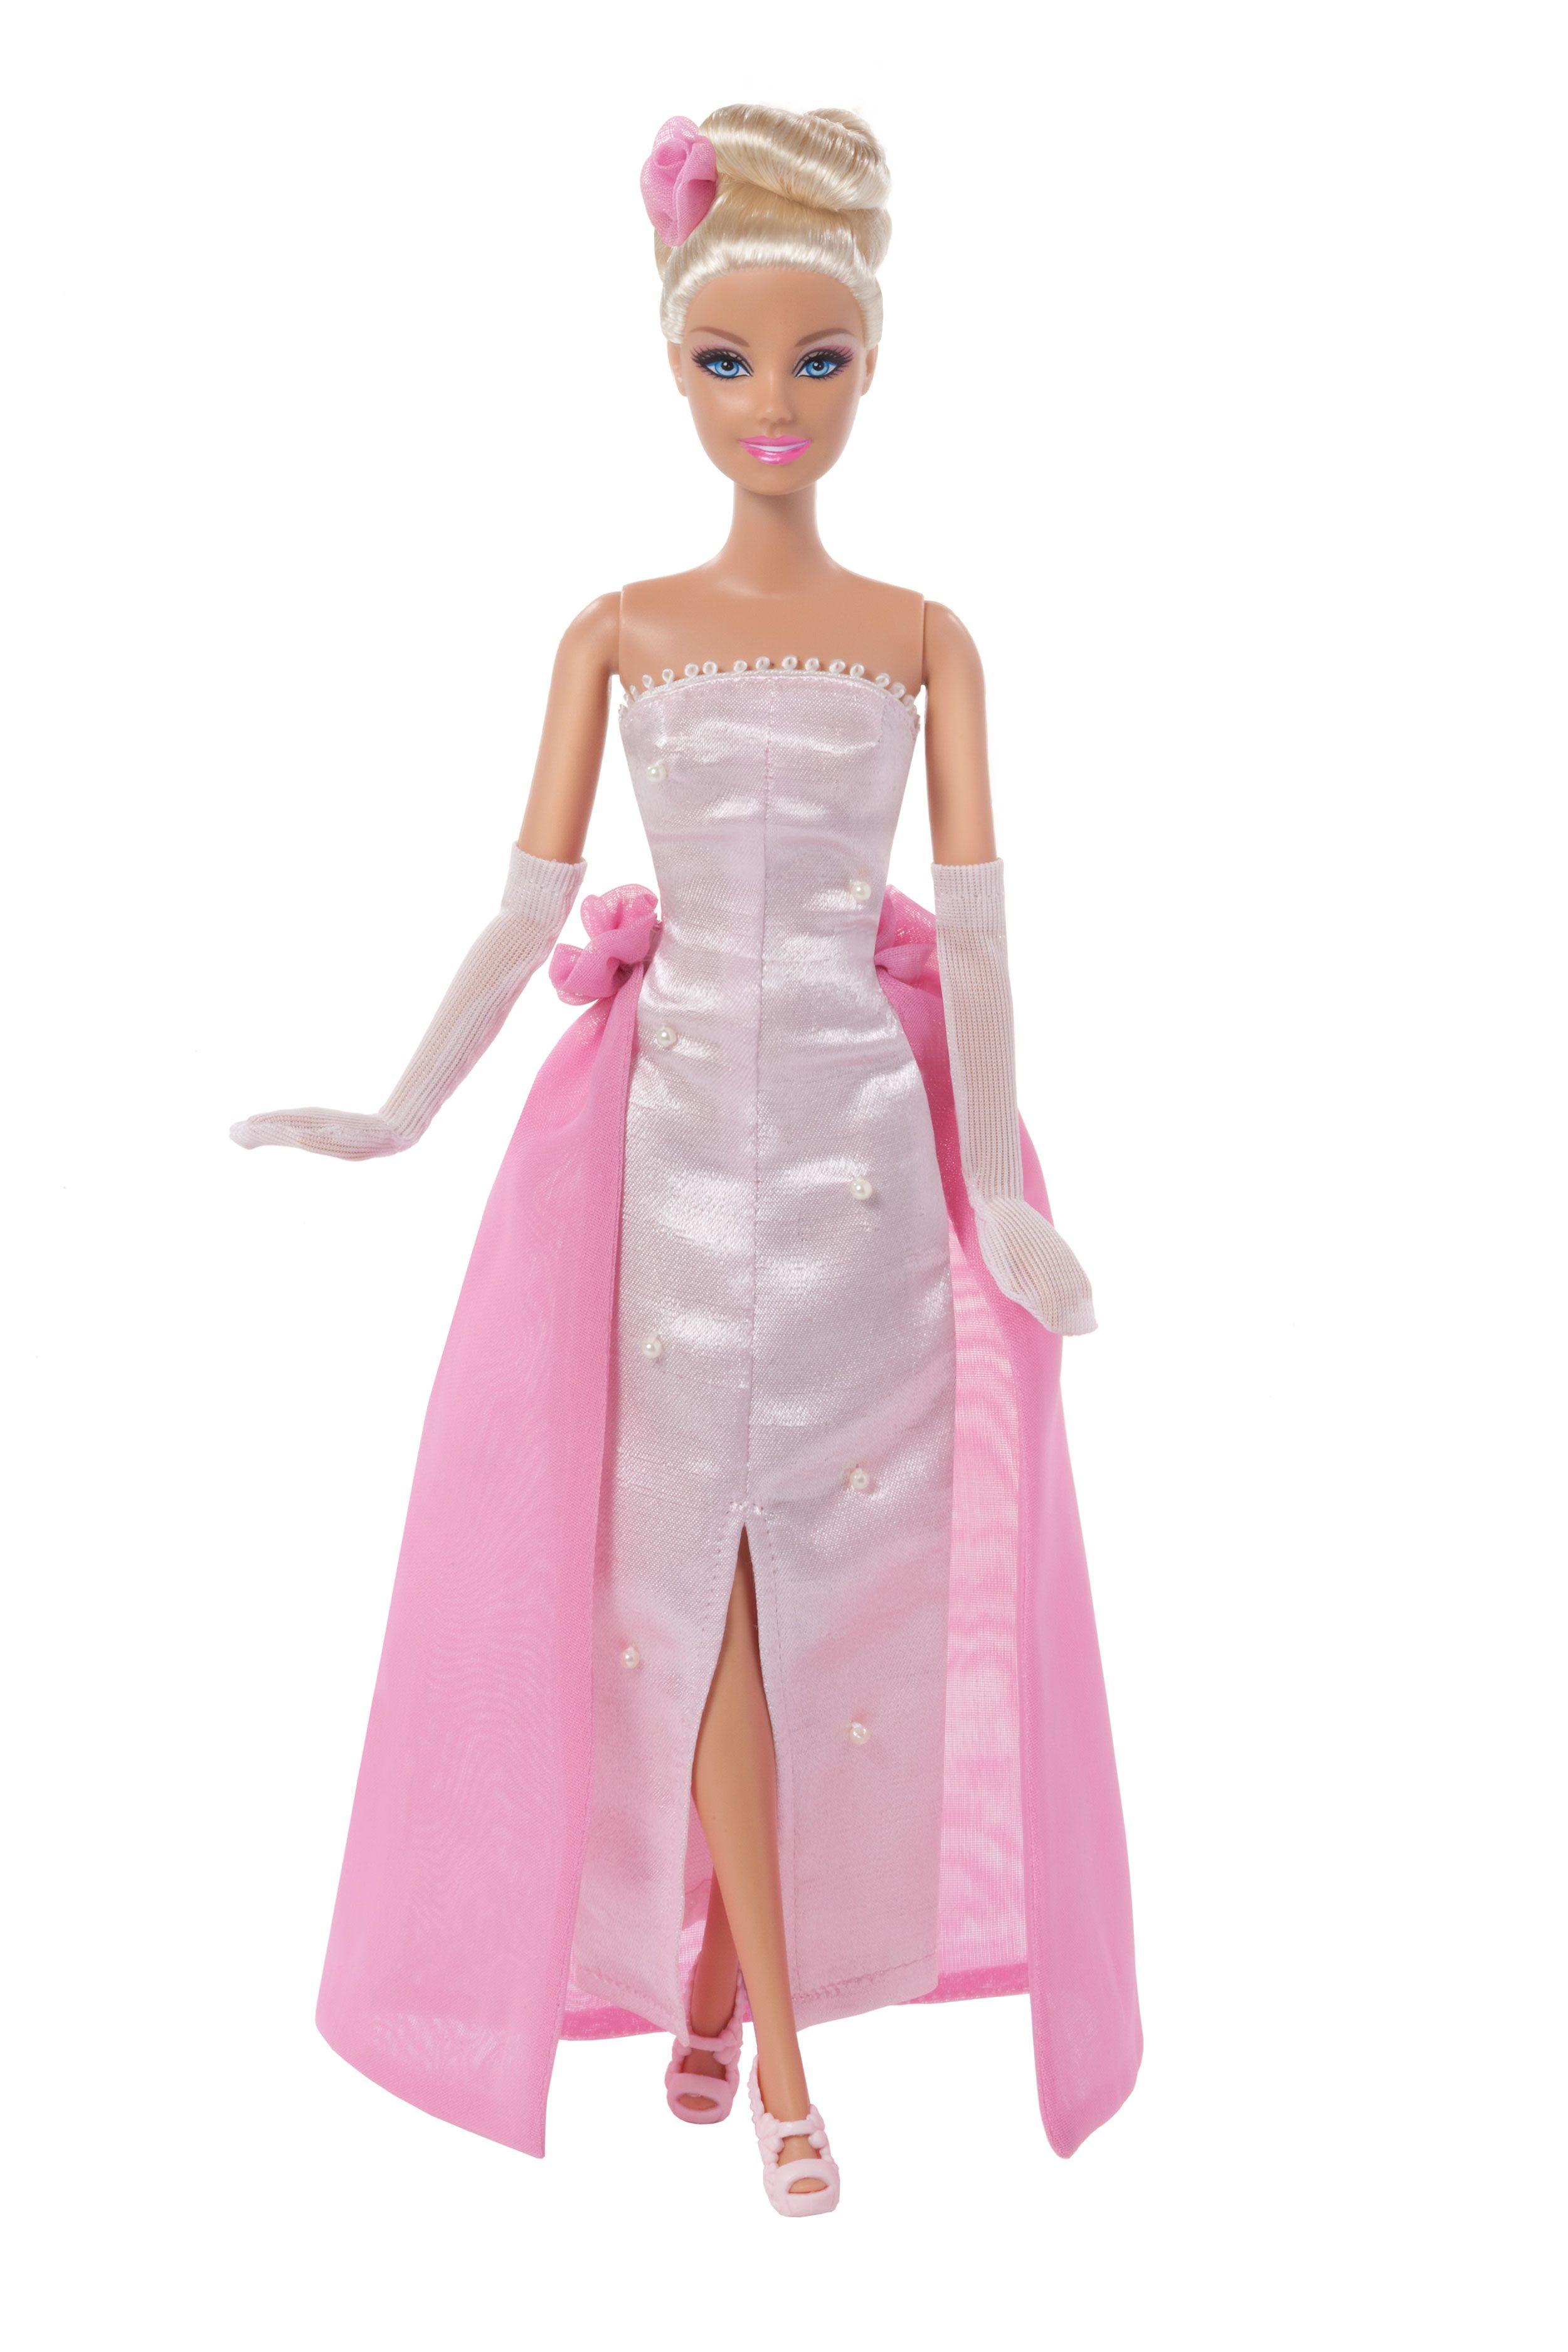 barbie alemania | barbie | Pinterest | Alemania, Barbie y Muñecas